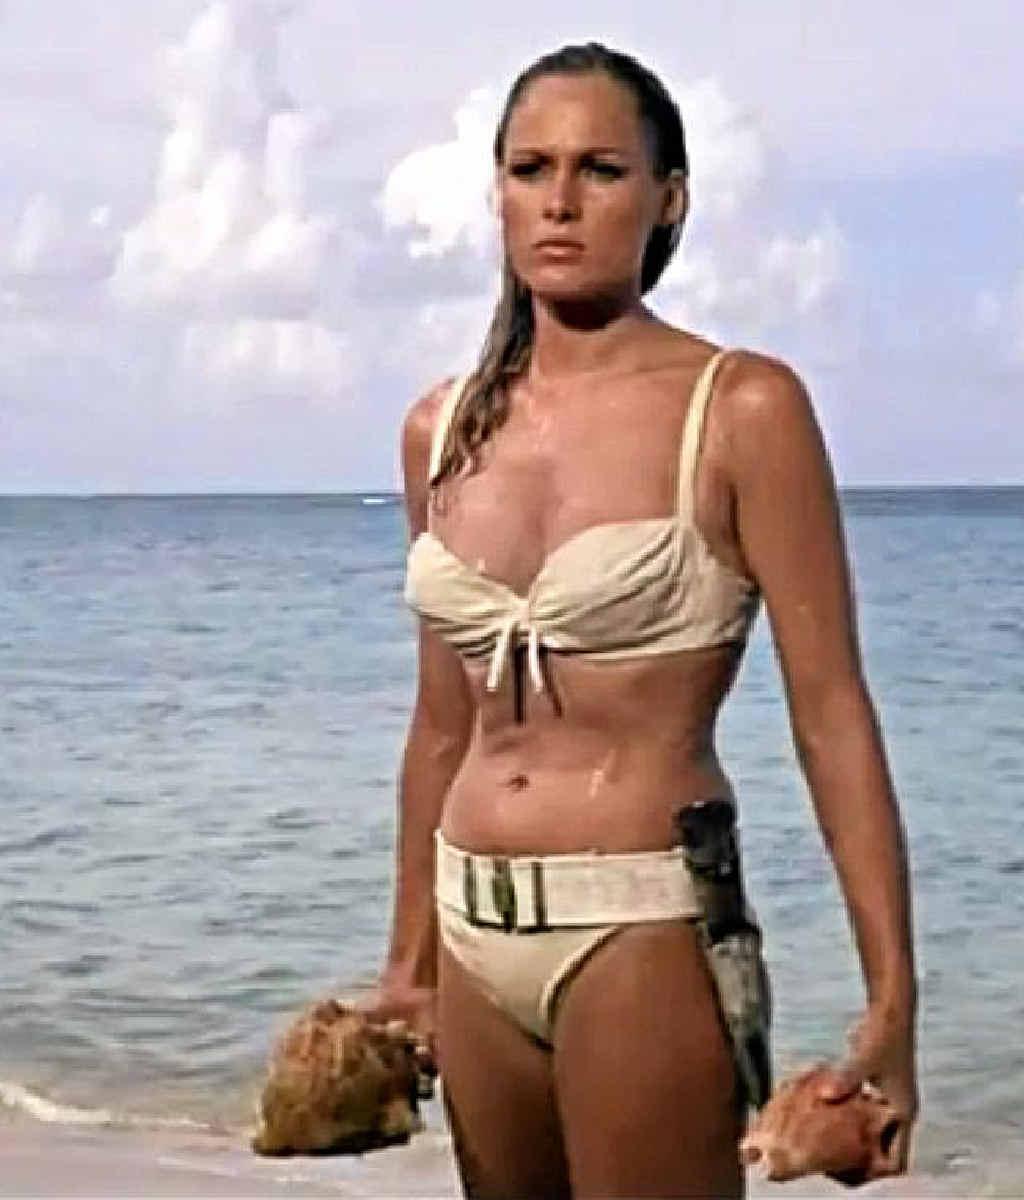 We can't all look like Ursula Andress in a bikini.